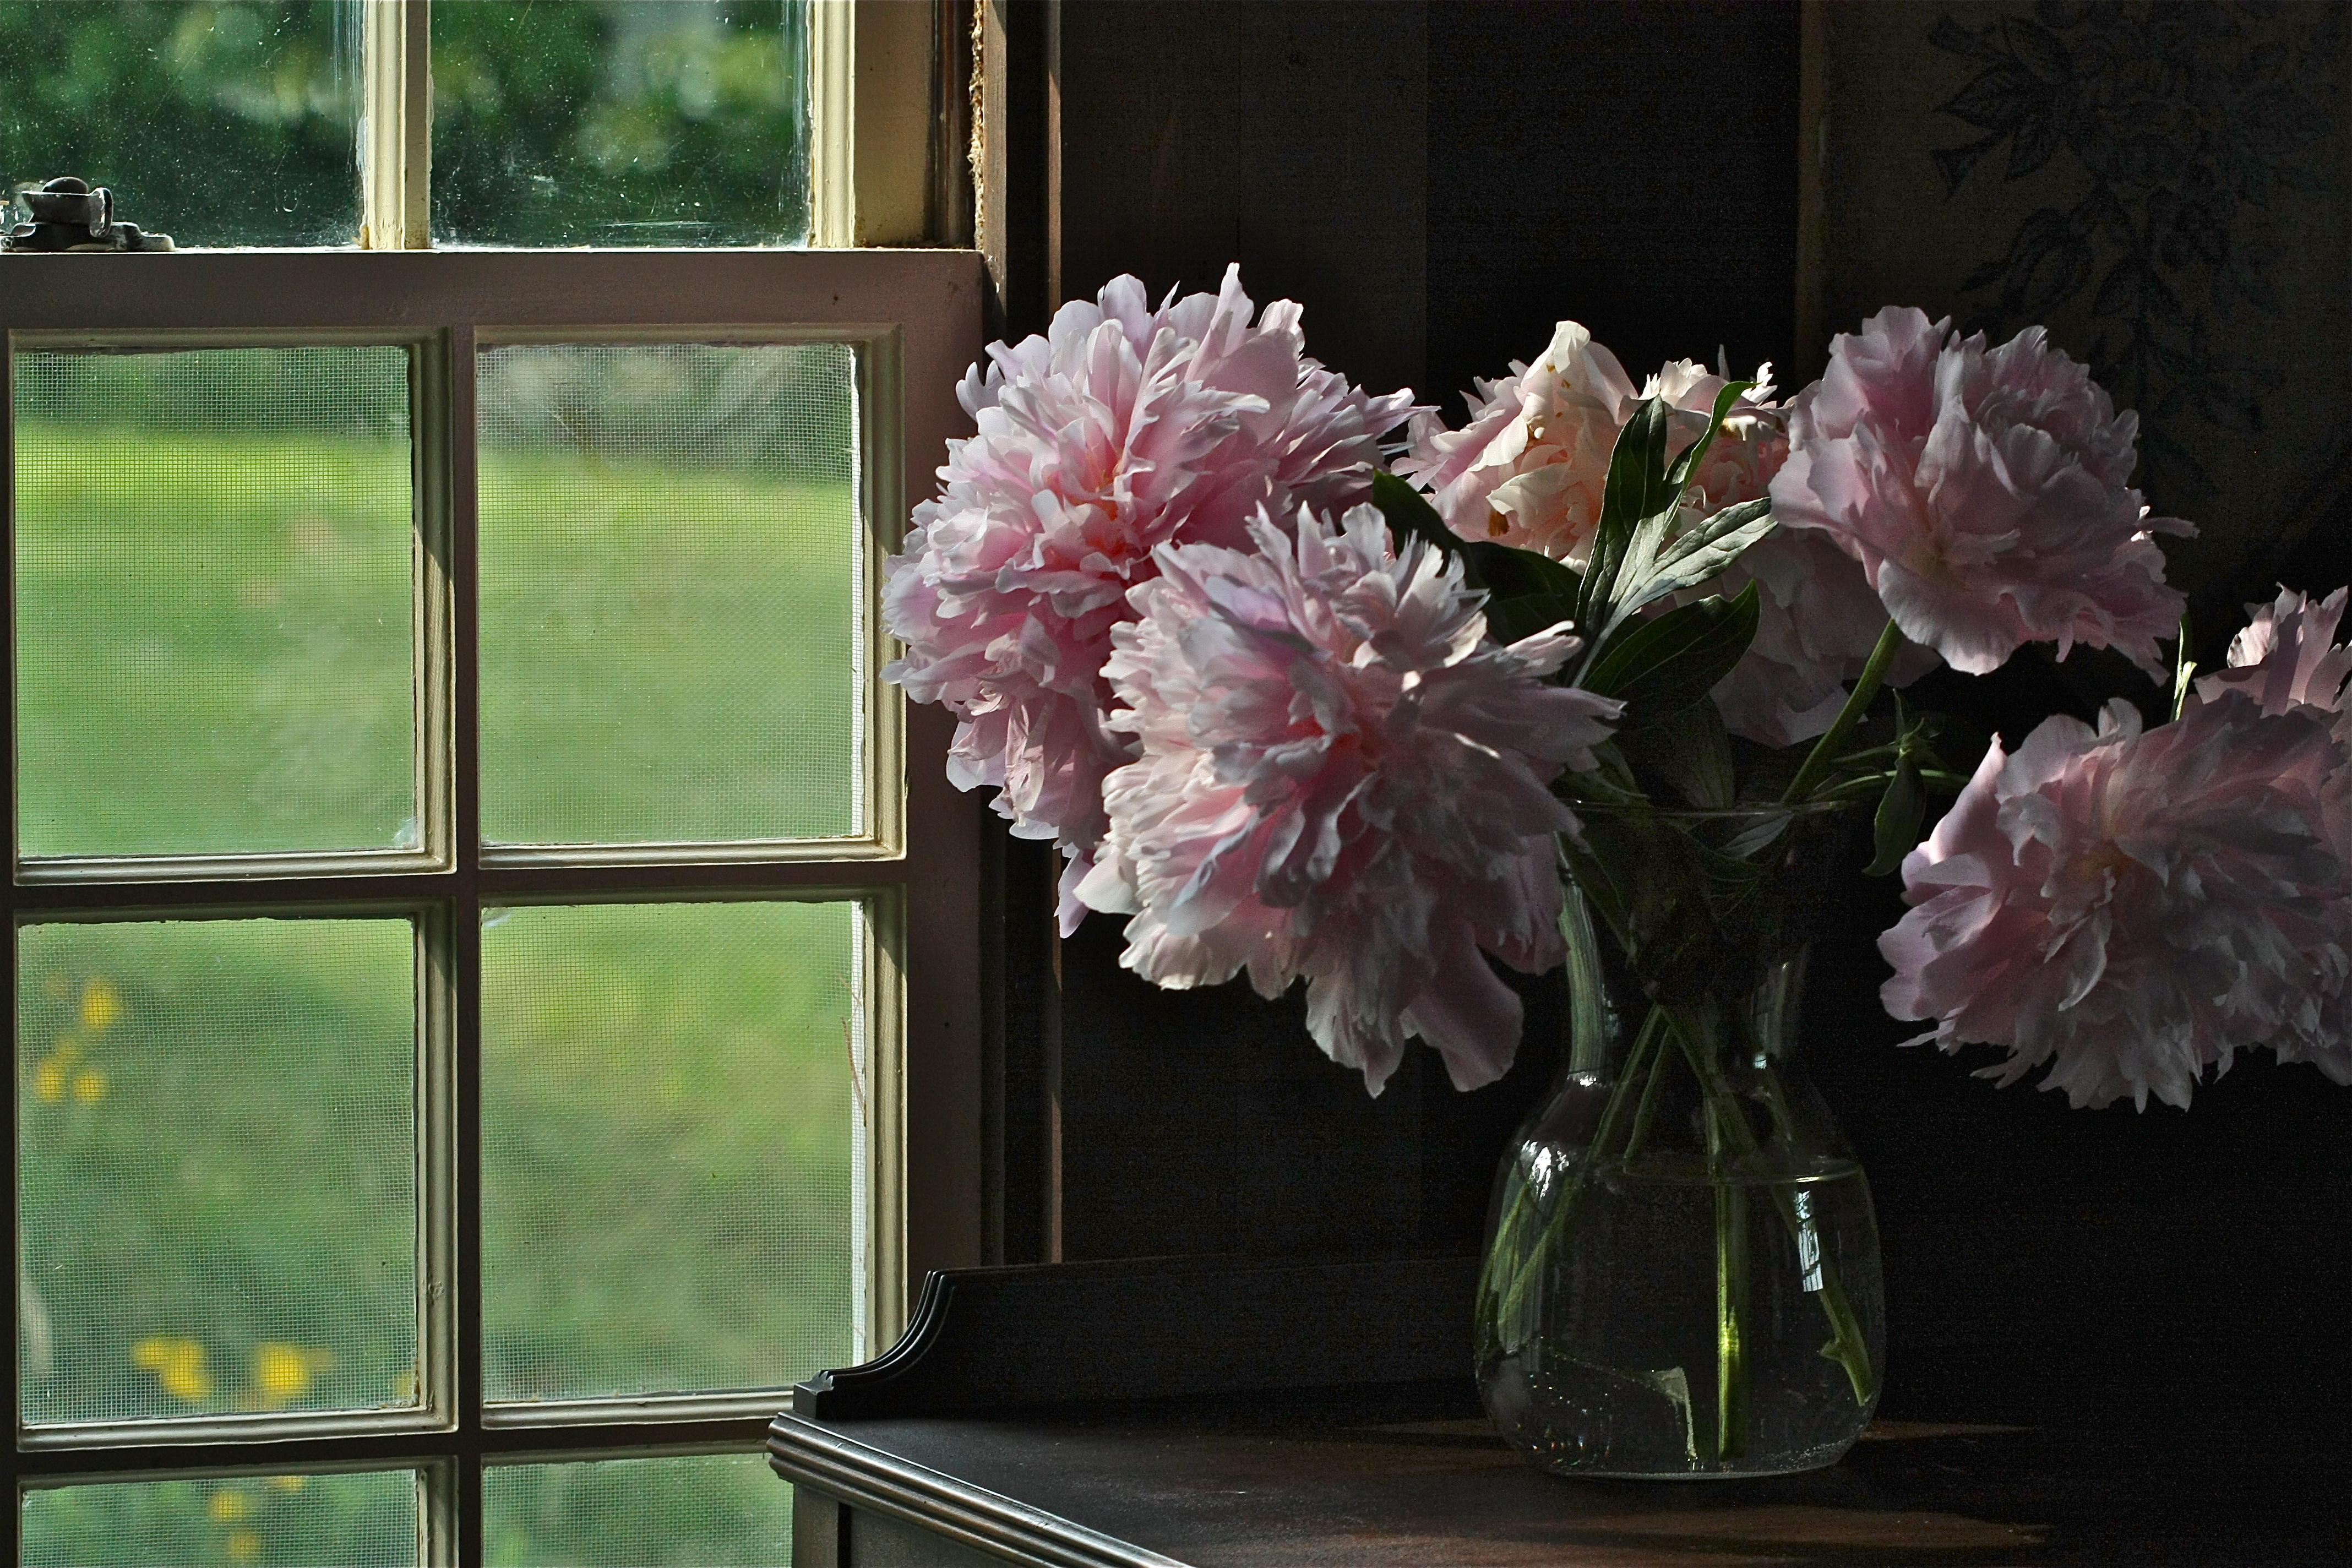 Fond D Ecran Fenetre Interieur Verre Rose Printemps Hortensia